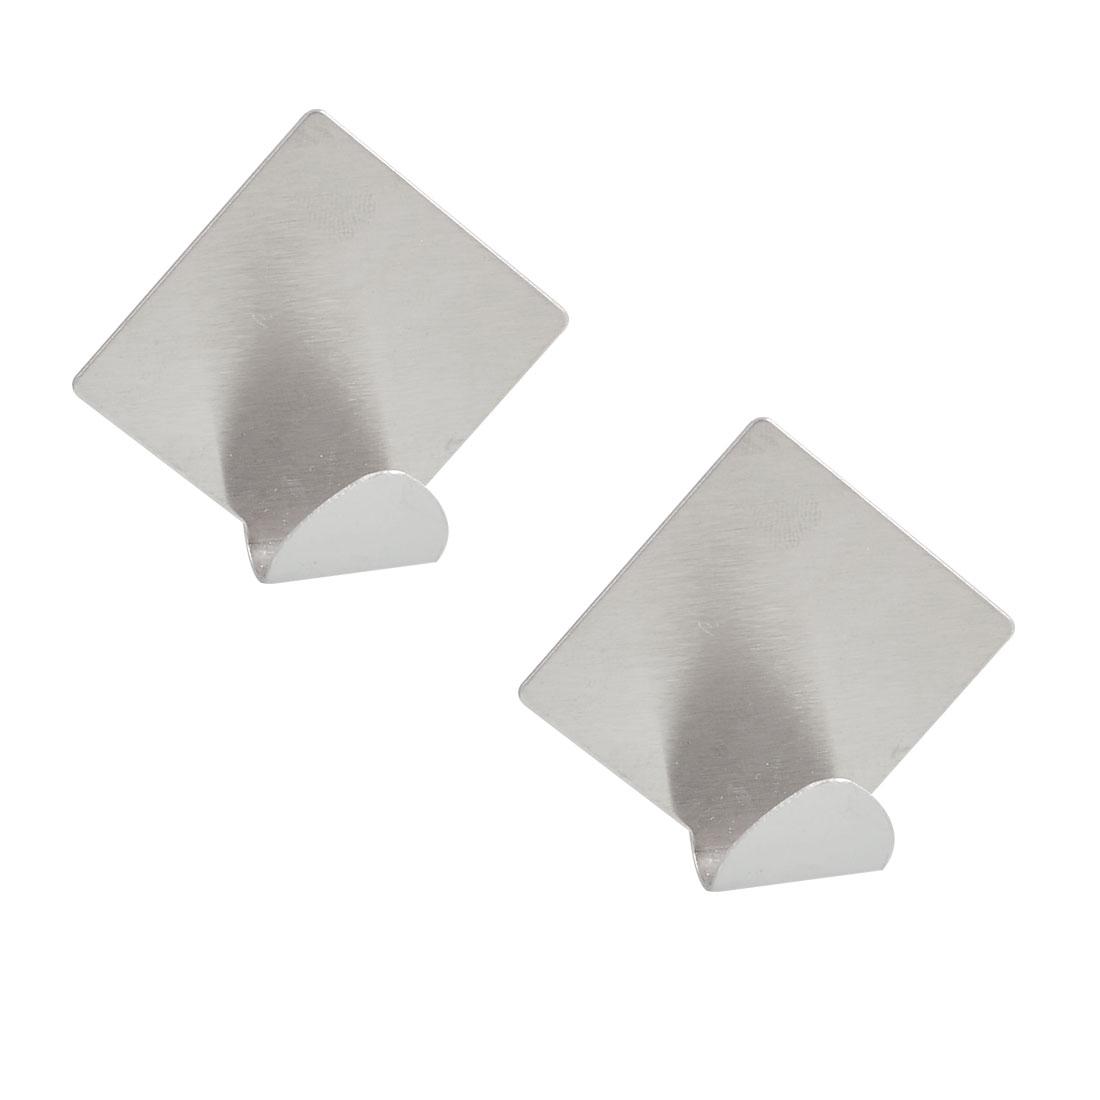 Bathroom Stainless Steel Rhombus Style Sticky Wall Hooks Pair